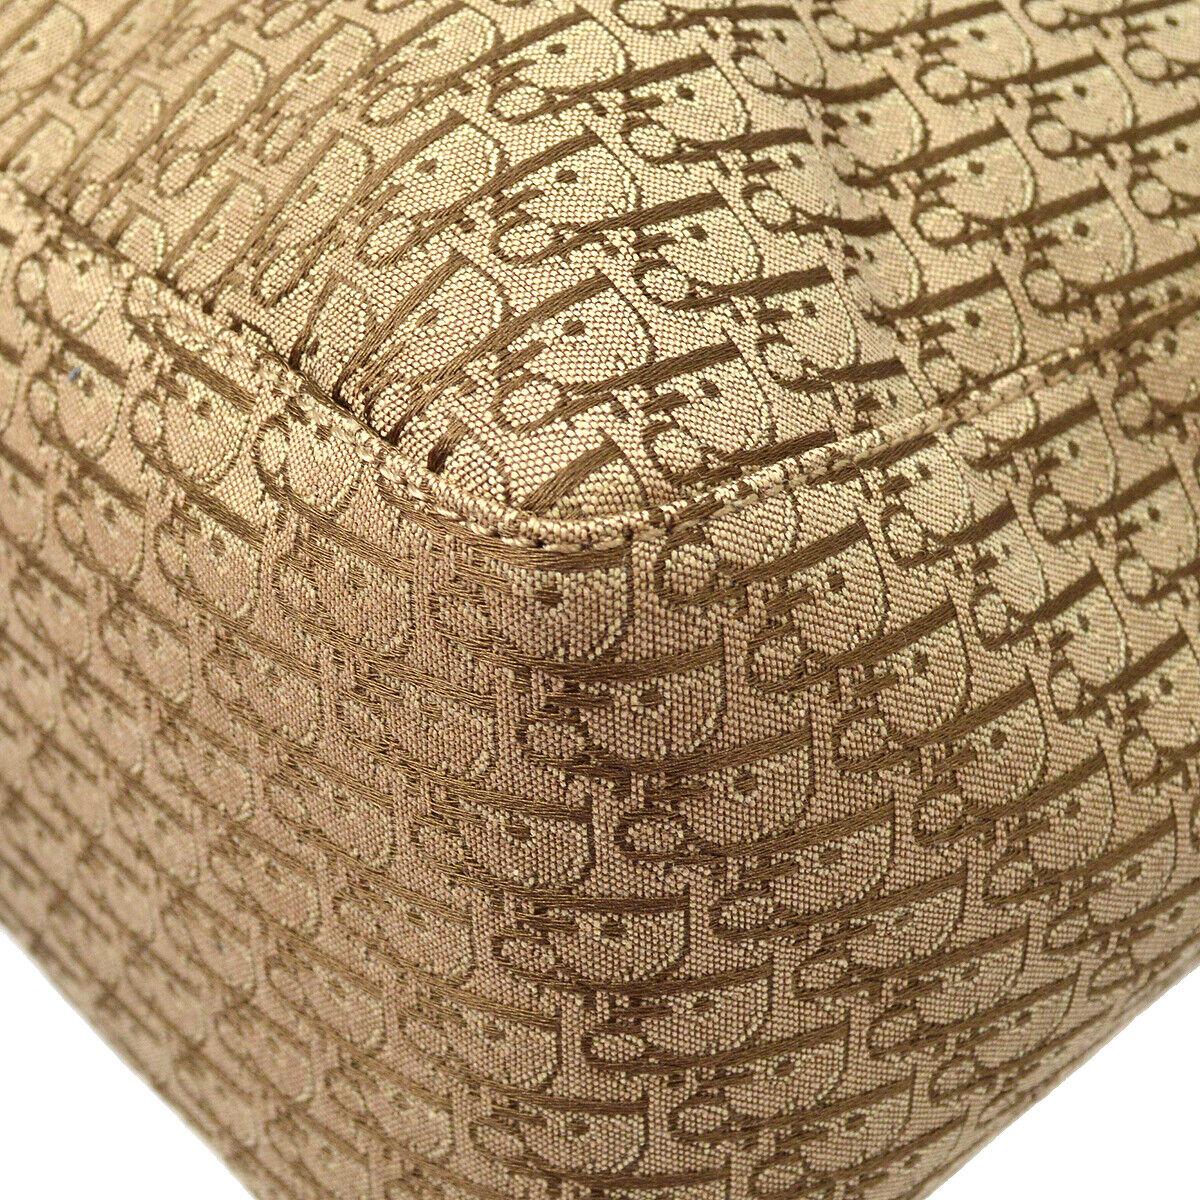 Christian dior trotter motif main tote bag sac beige toile bol0093 40786